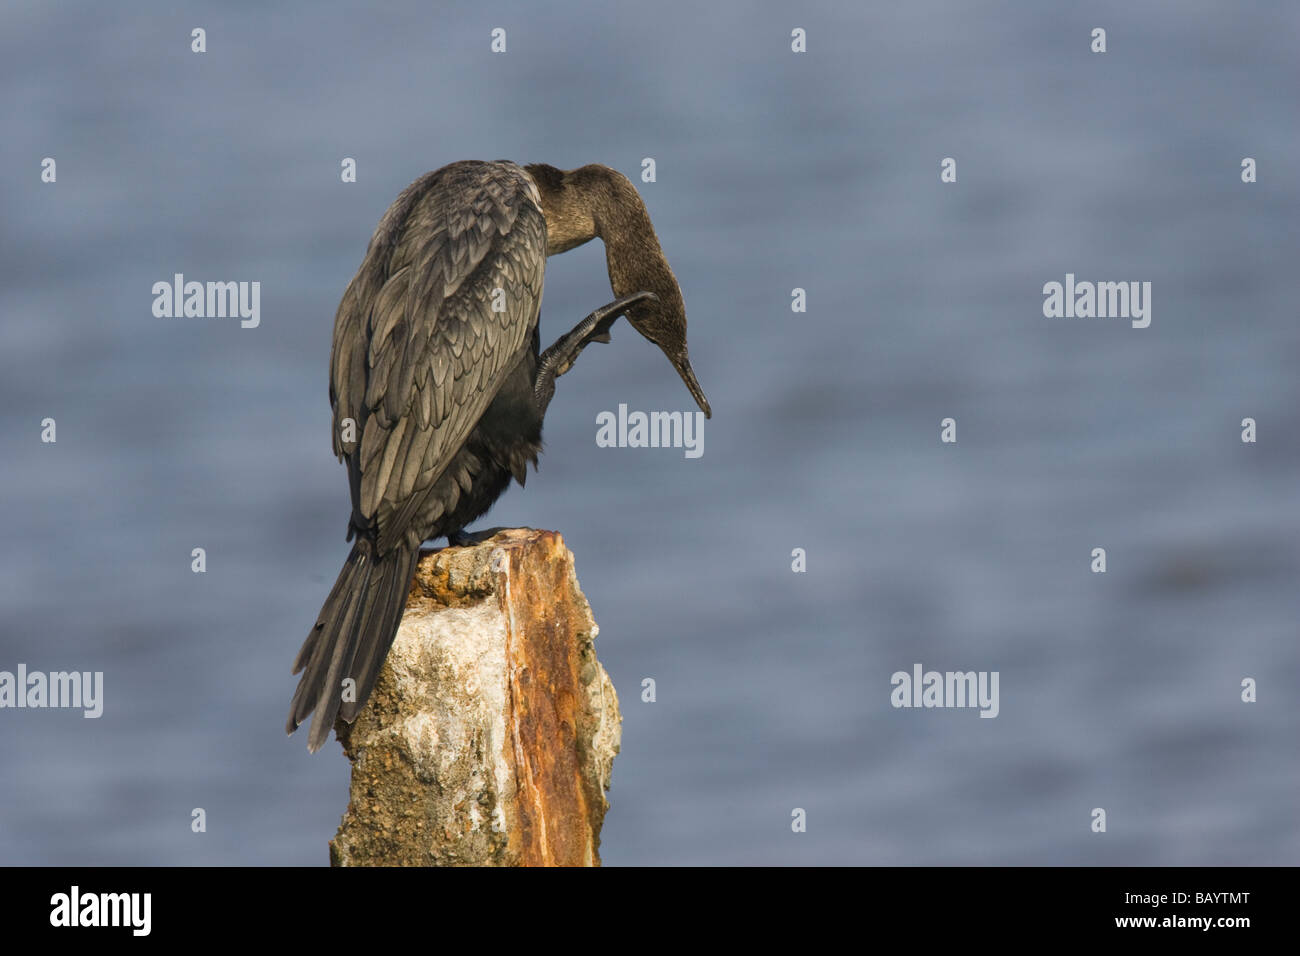 Adult Neotropic Cormorant (Phalacrocorax brasilianus) scratching its head with its foot - Stock Image